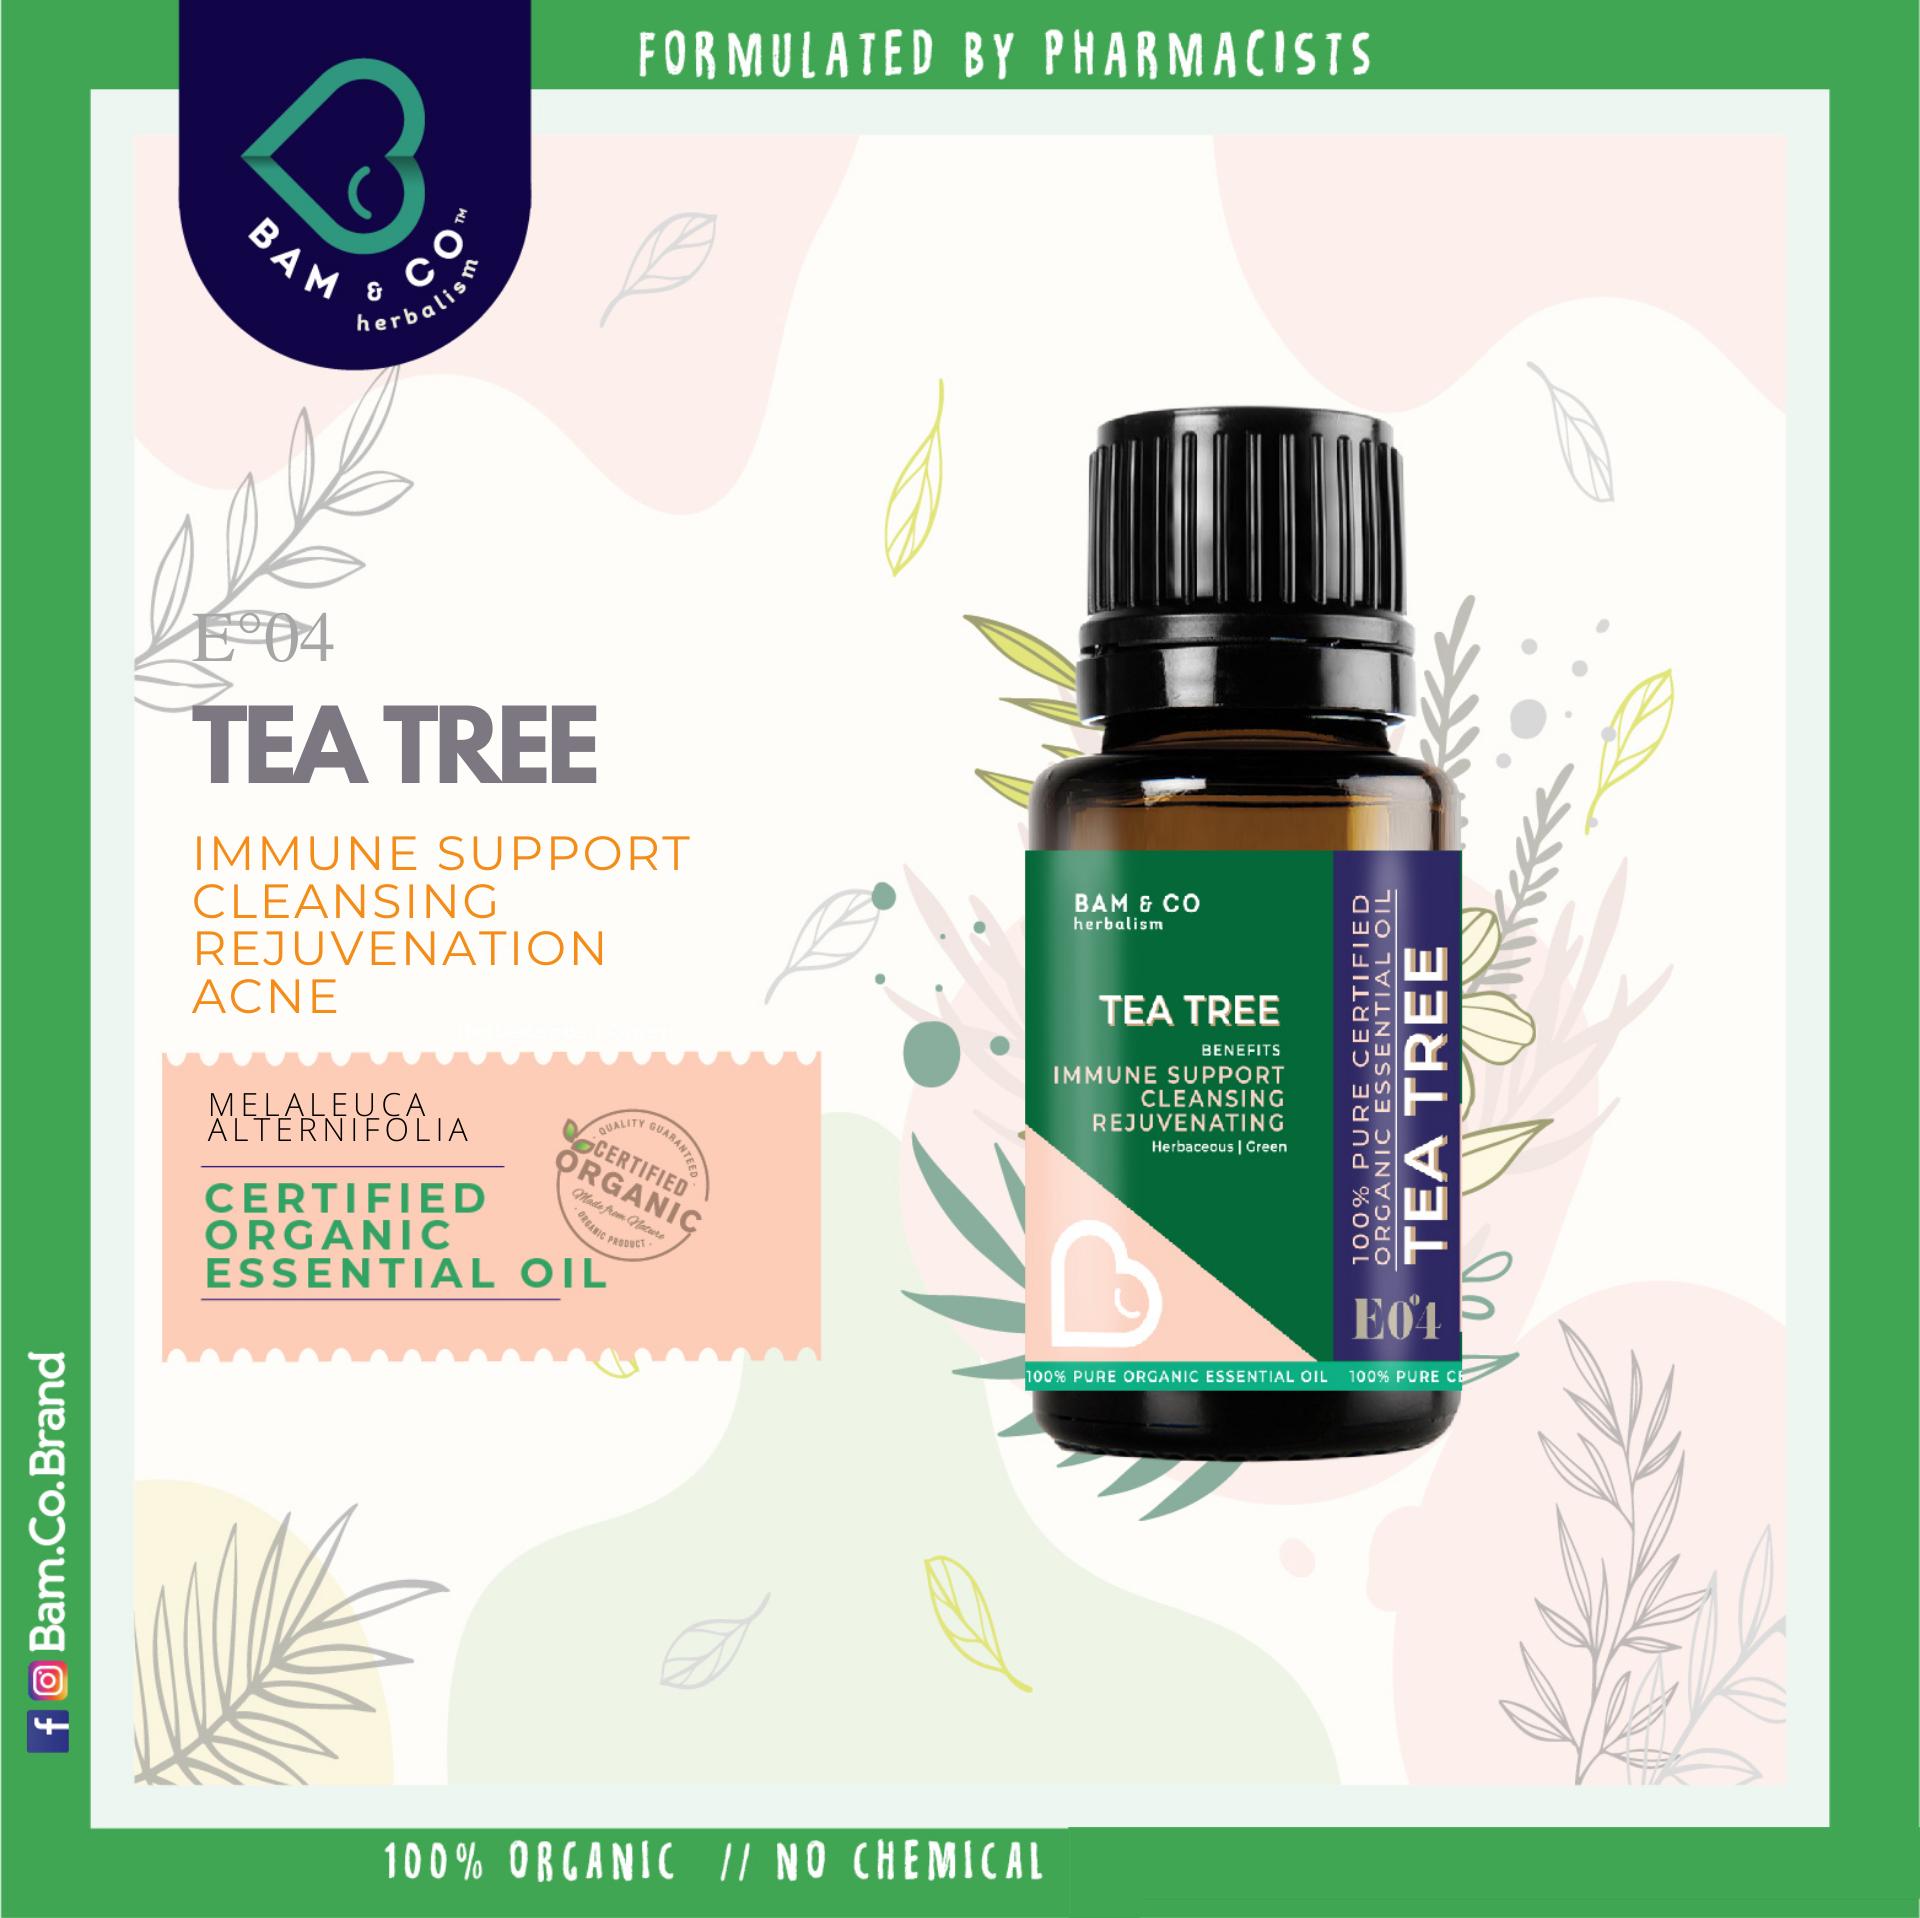 BAM & CO. TEATREE Melaleuca Tea Tree CERTIFIED PURE ORGANIC ESSENTIAL OIL Antiseptic Antibacteria PERFECT FOR HUMIDIFIER 5ML 10ML